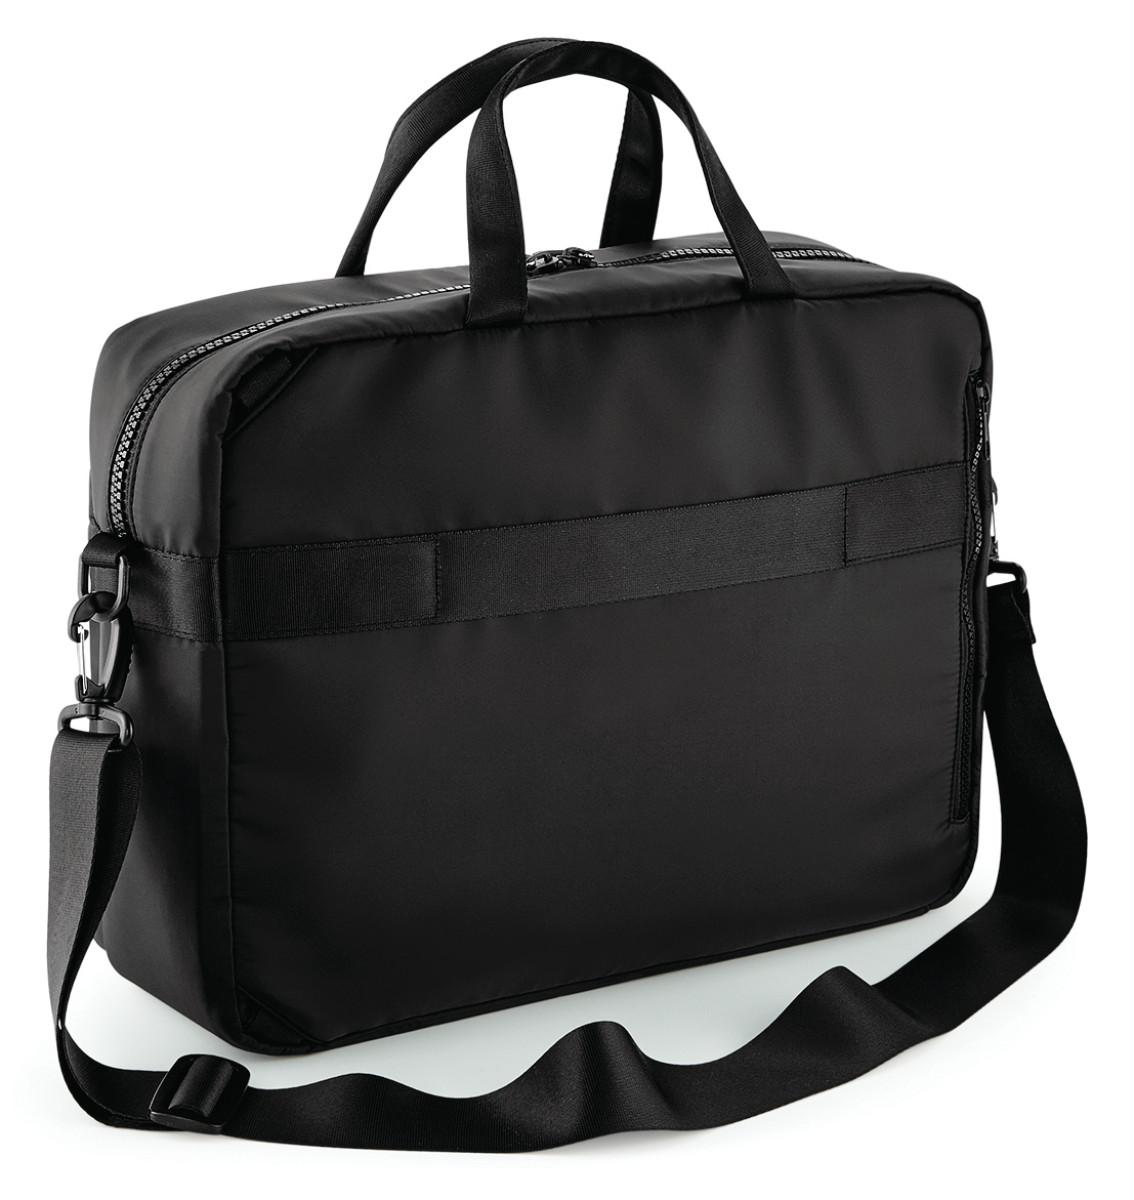 Quadra Tokyo Laptop Messenger Bag